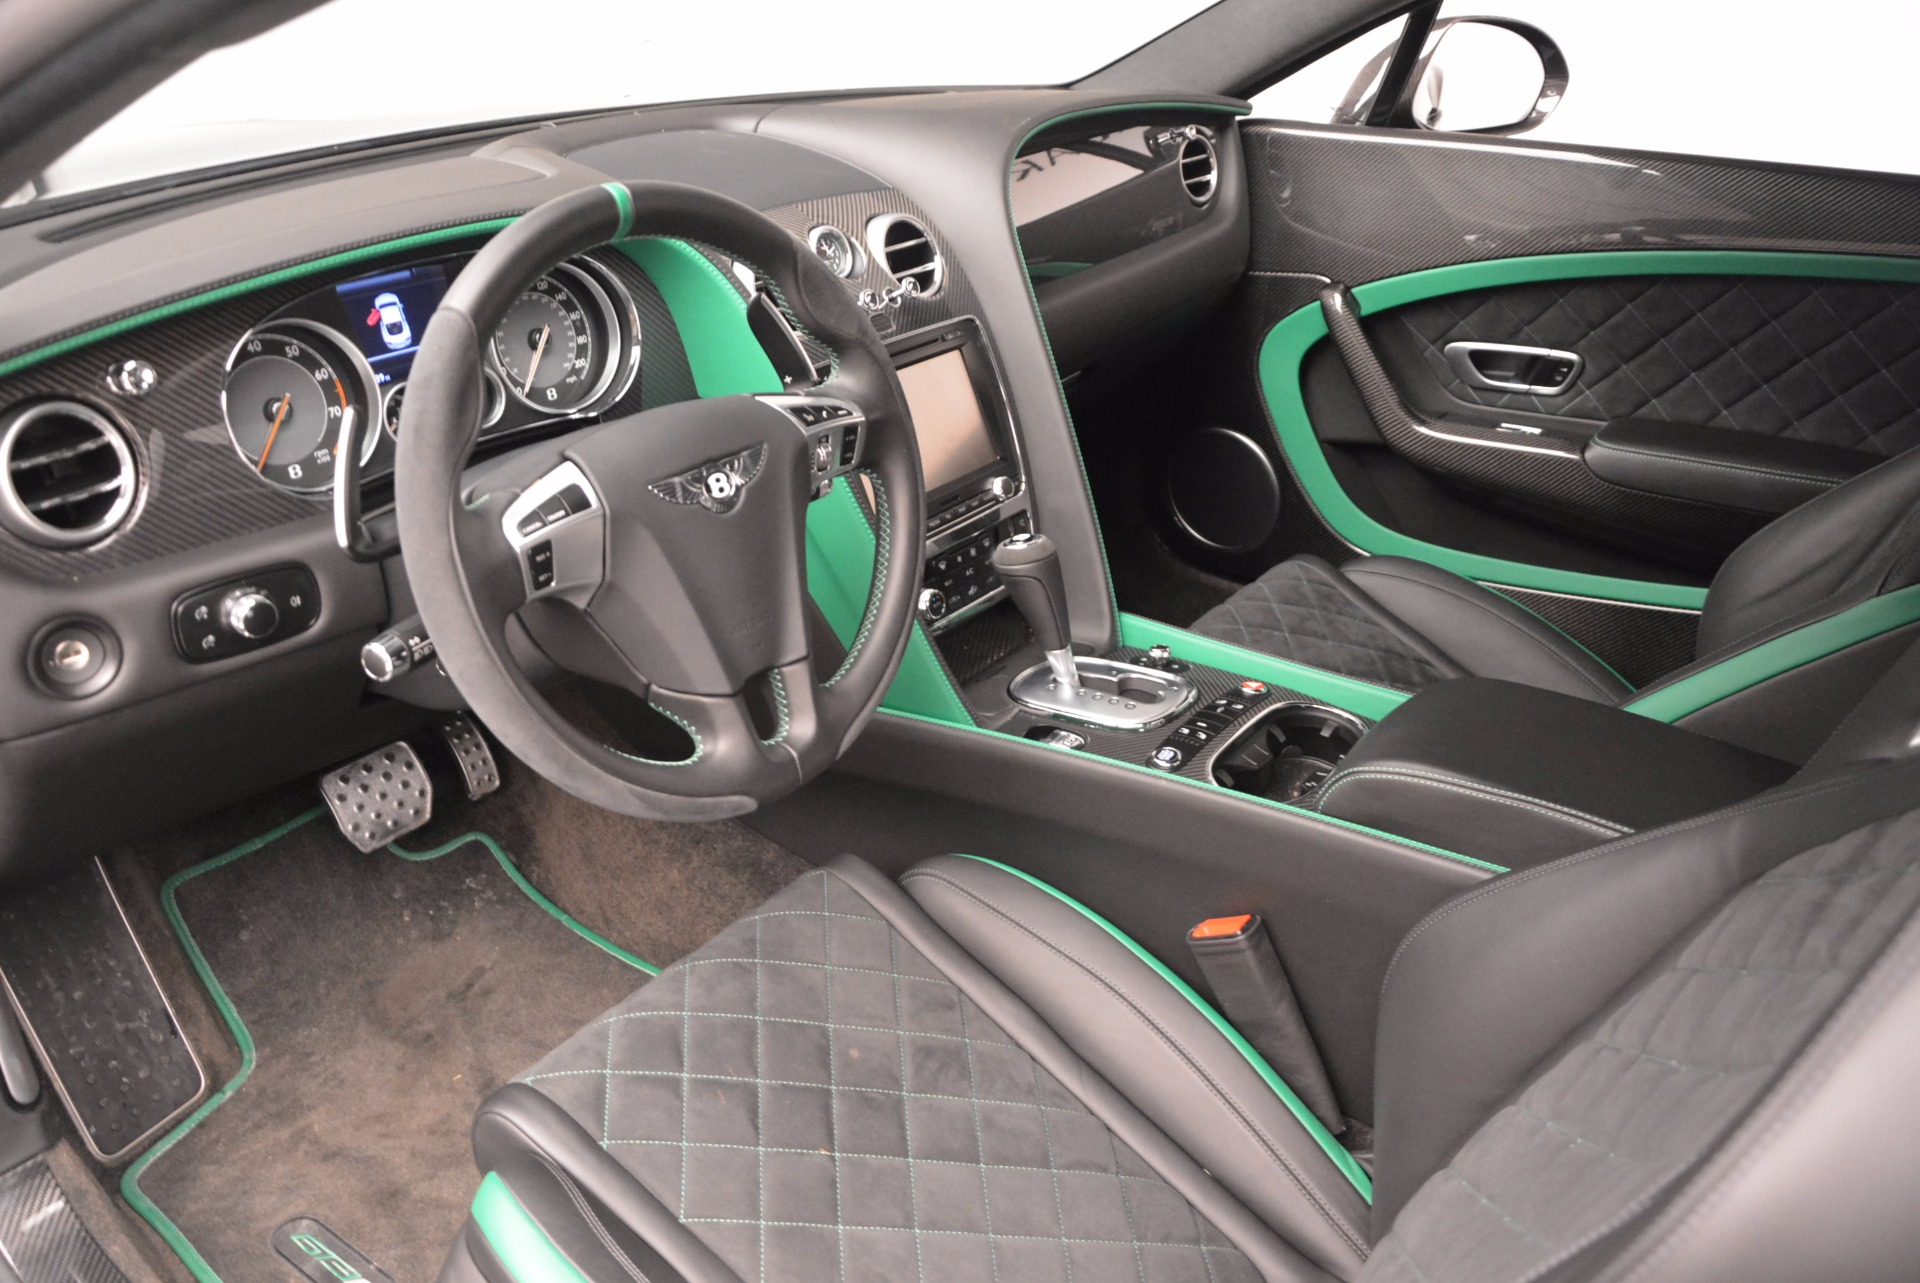 Used 2015 Bentley Continental GT GT3-R For Sale In Westport, CT 1002_p27